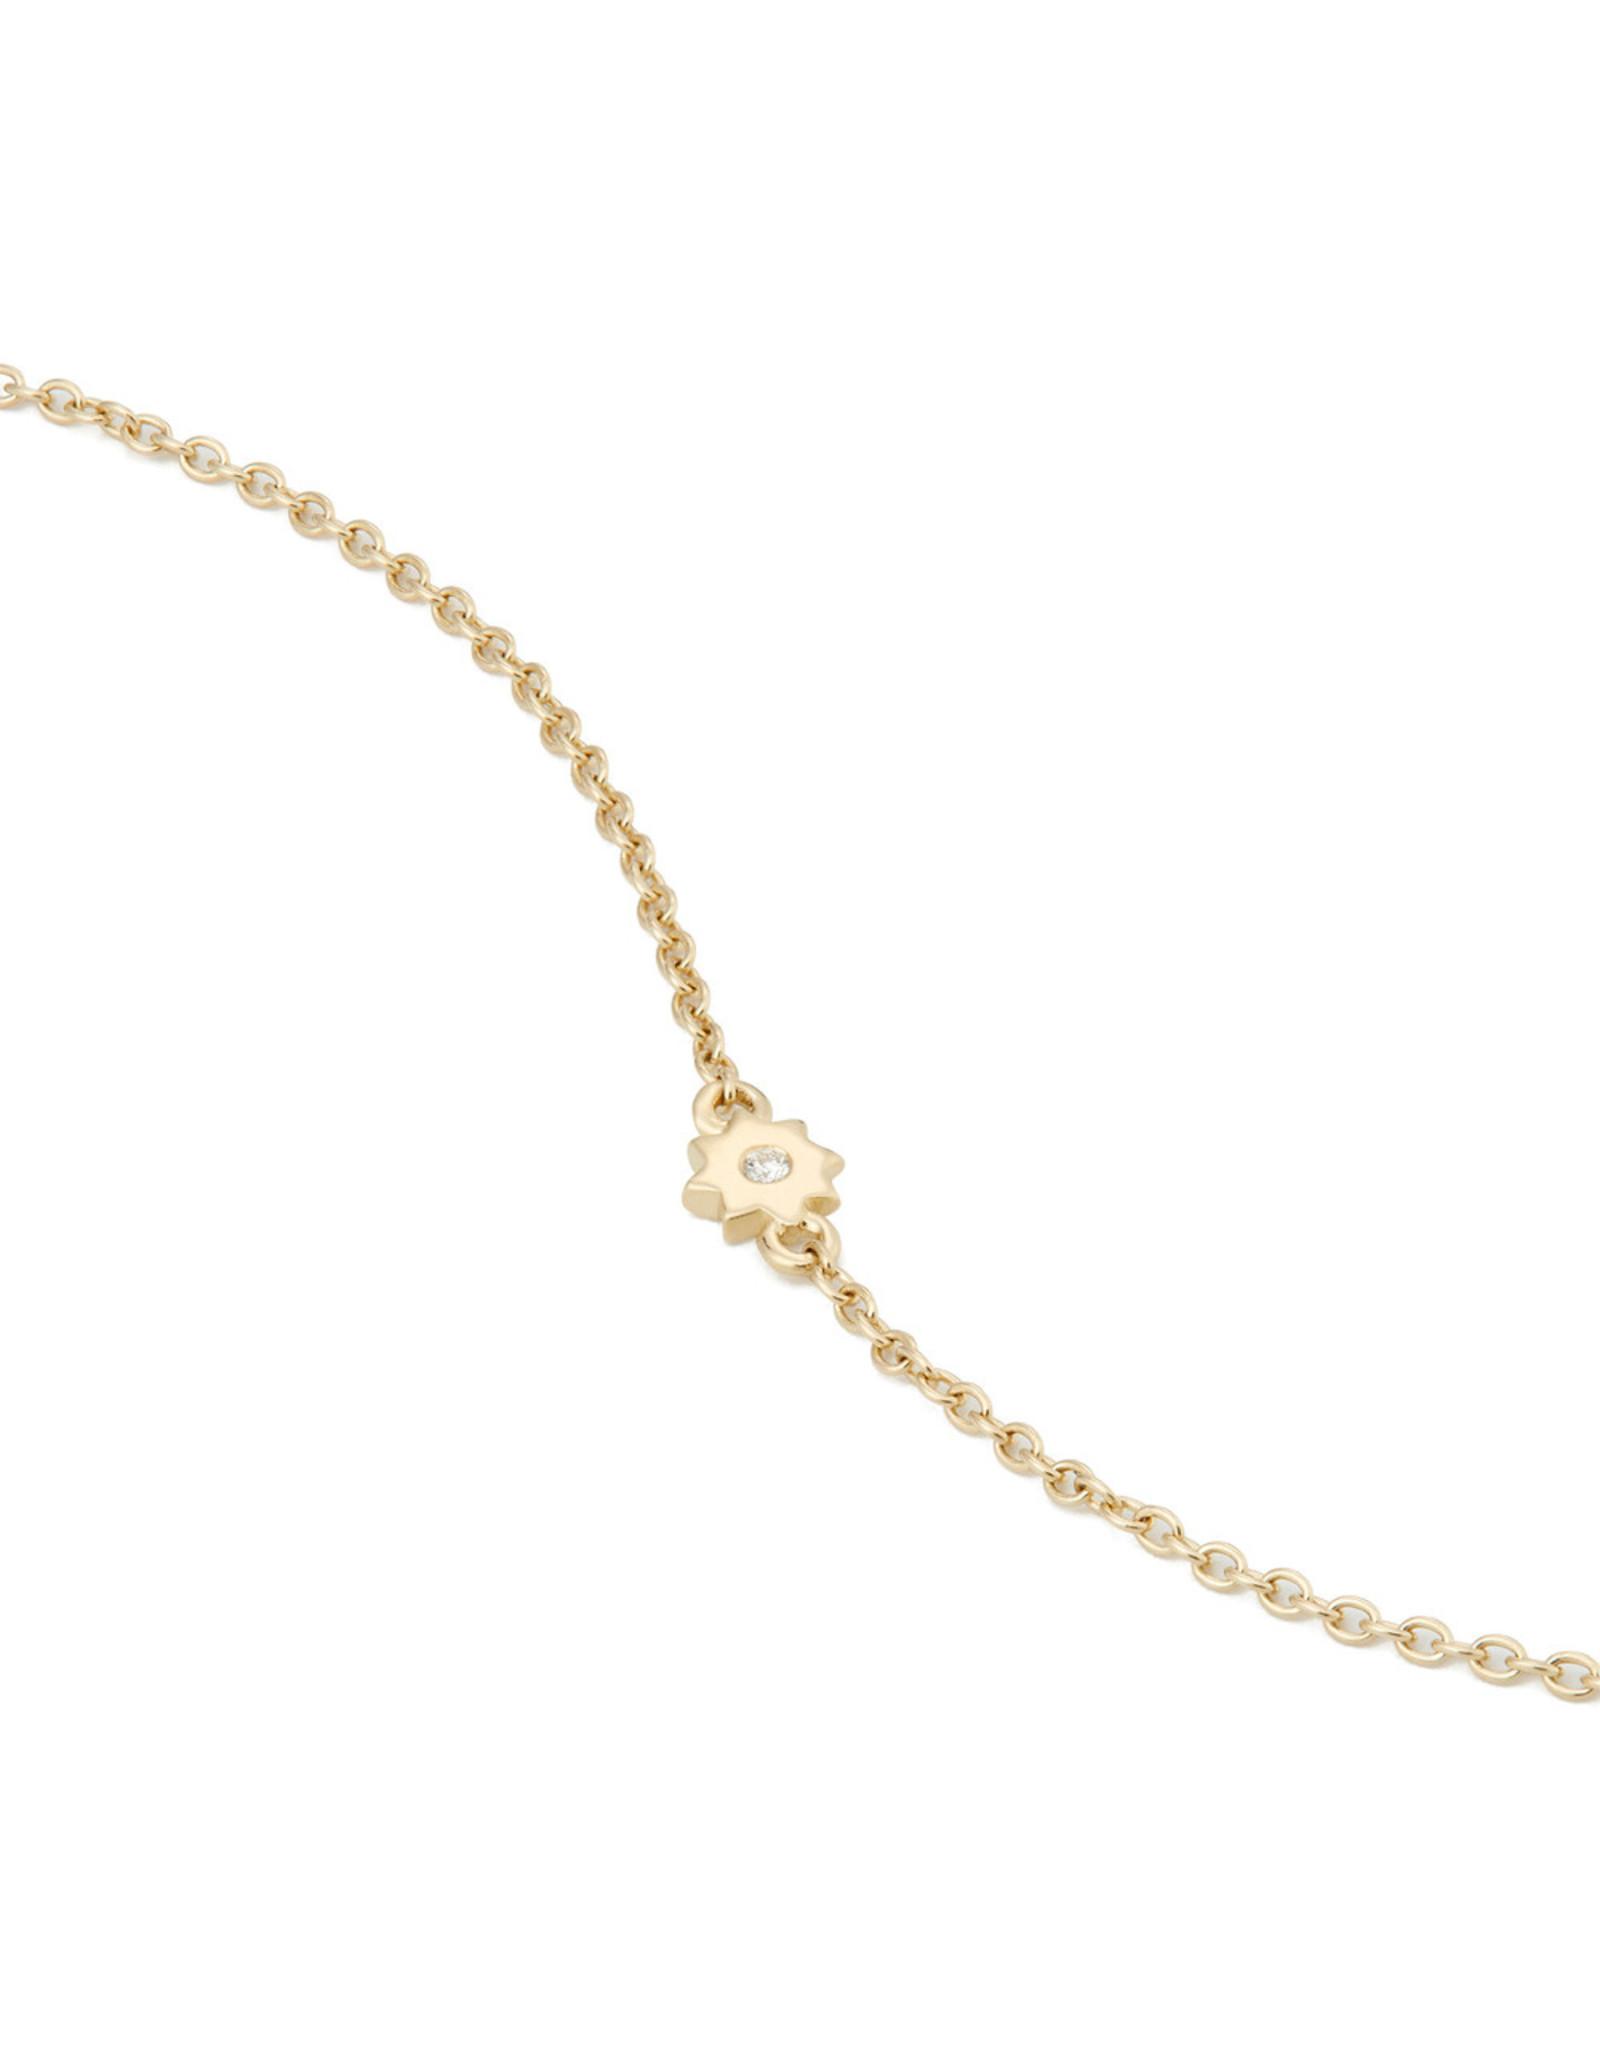 Bondeye Jewelry Bondeye Burst 14K Yellow-Gold Necklace (Color: Yellow Gold / White Diamond)